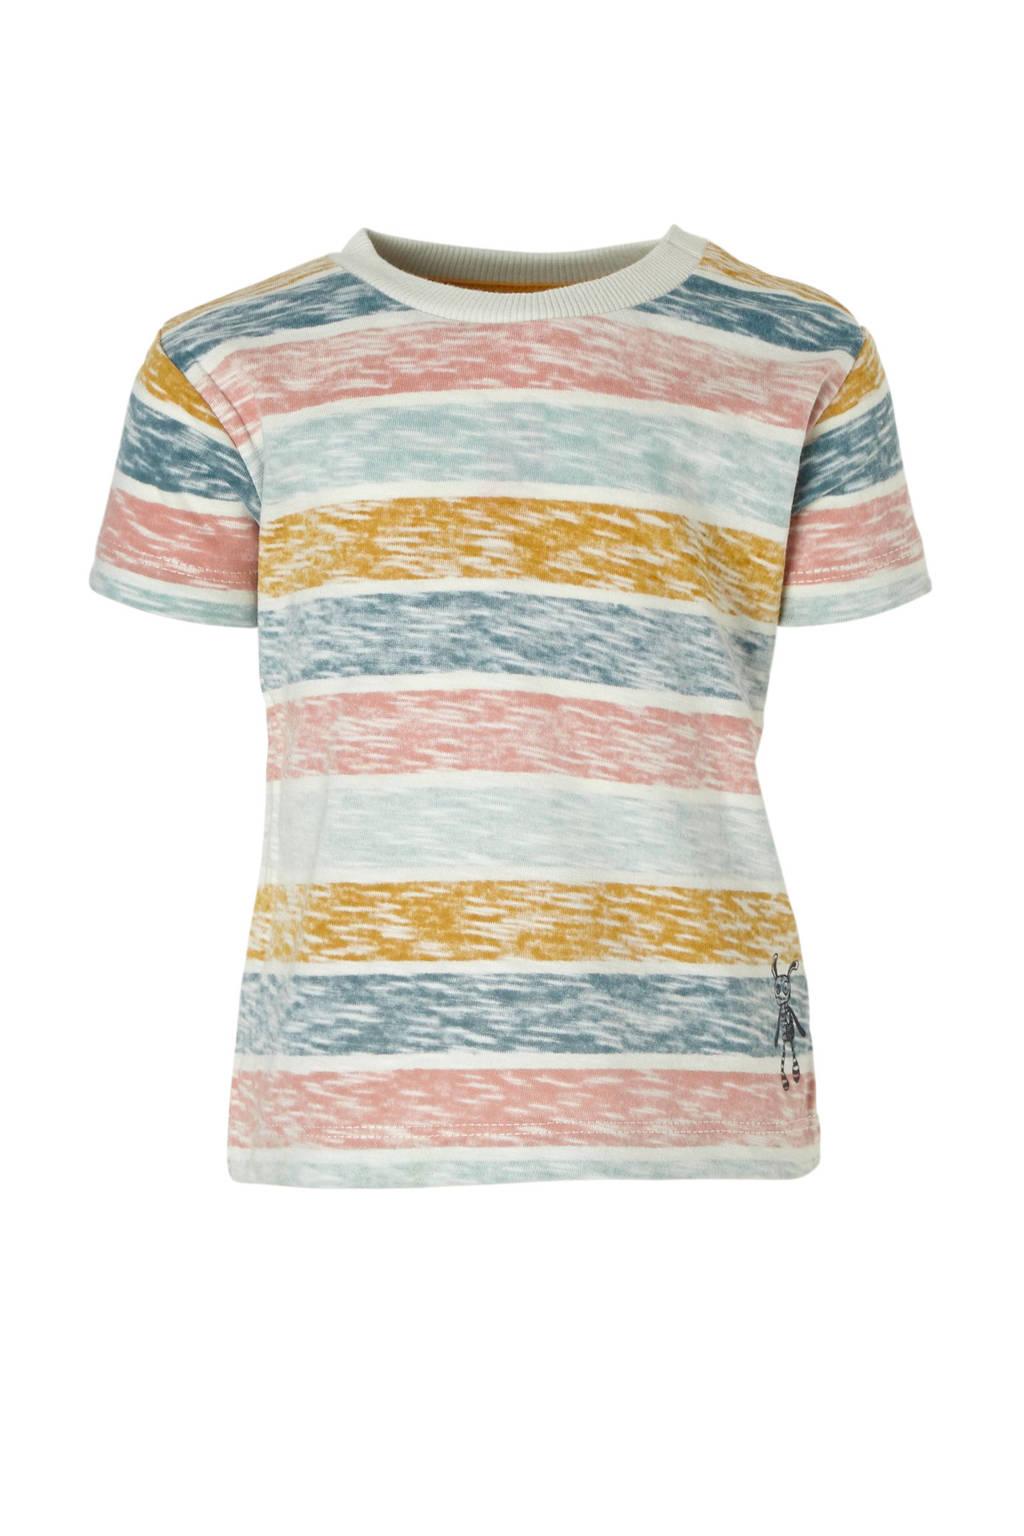 Small Rags gestreept T-shirt, Blauw/ Lichtblauw/ Roze